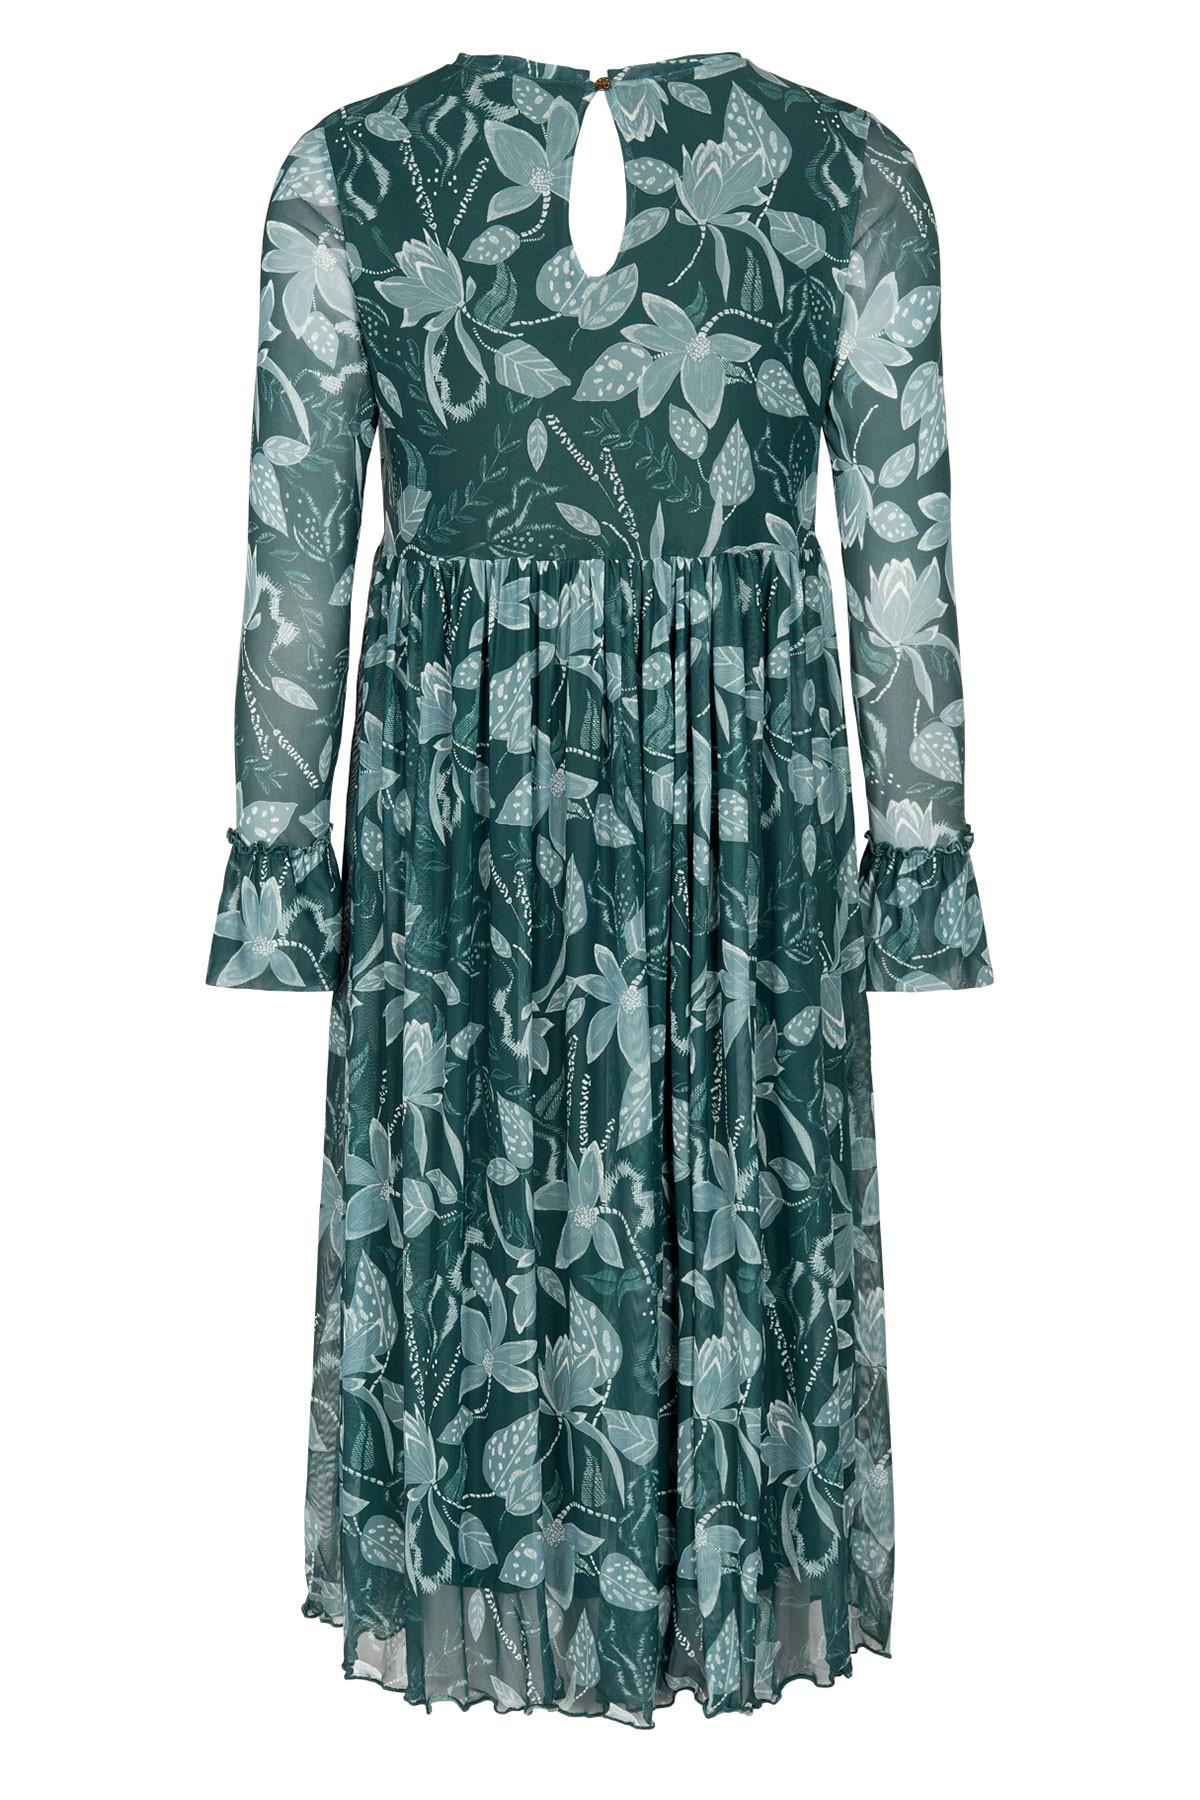 NUMPH Nuaada kjole » Køb den her